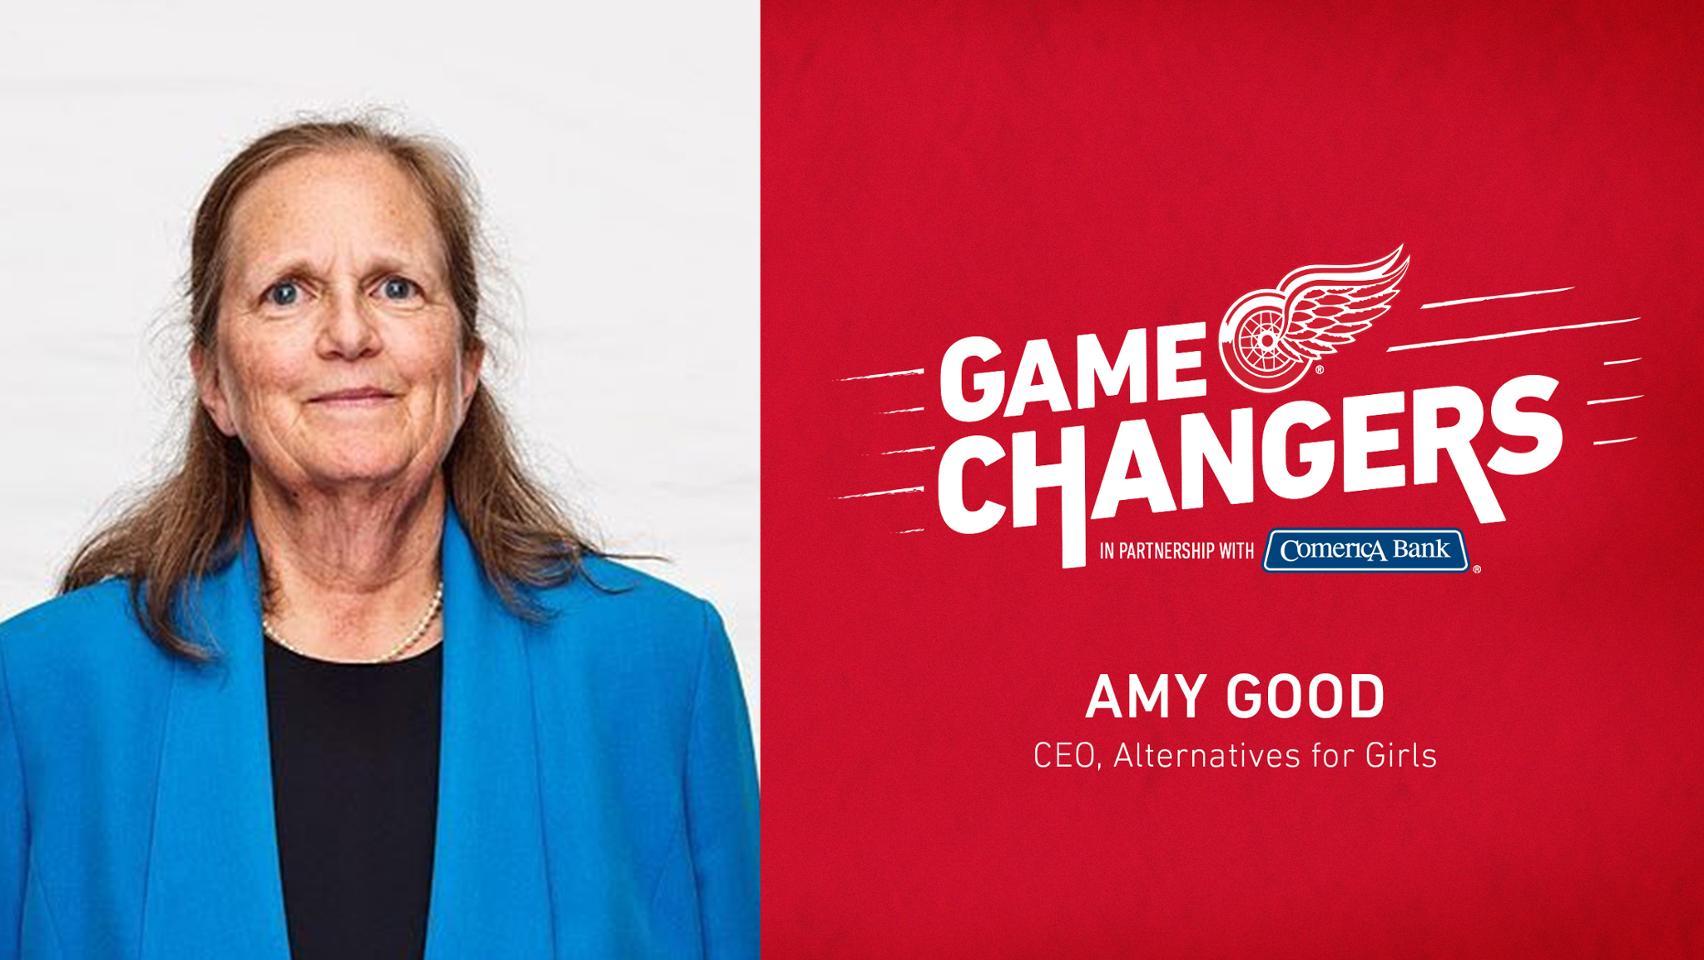 Amy Good